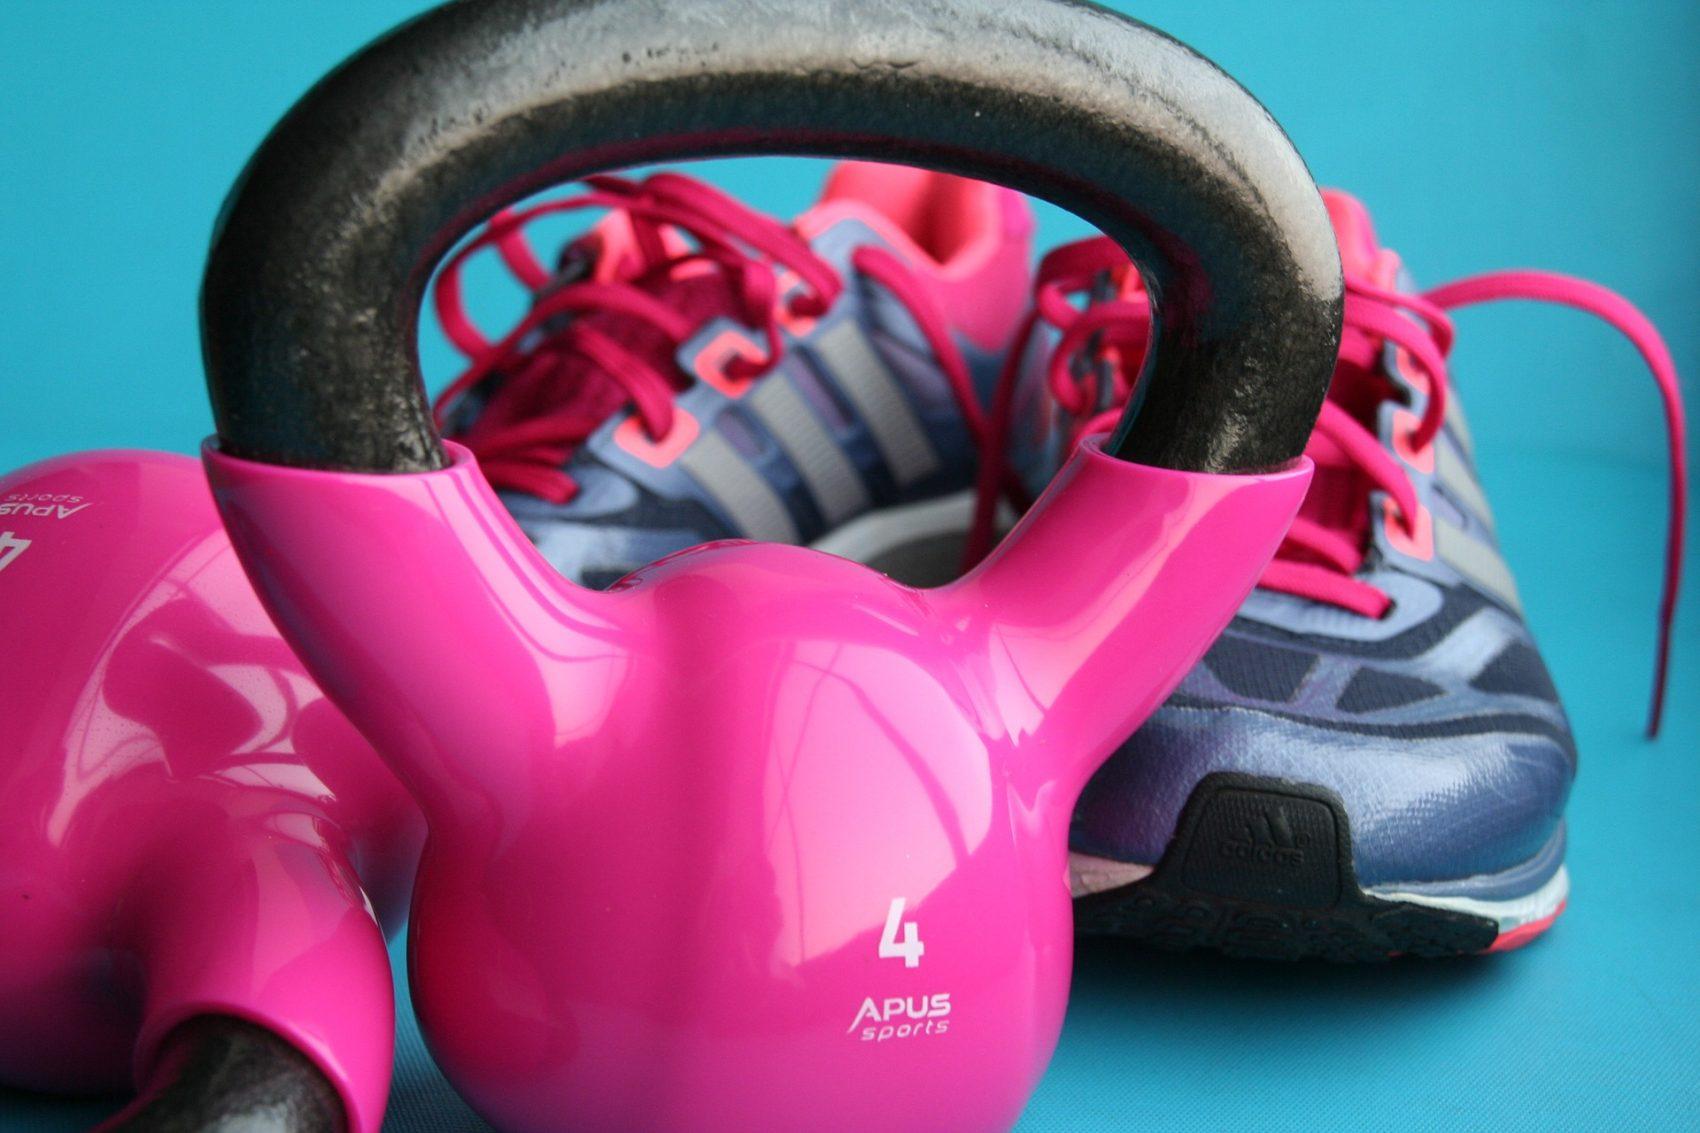 9 Ways To Make Your Workout More Fun